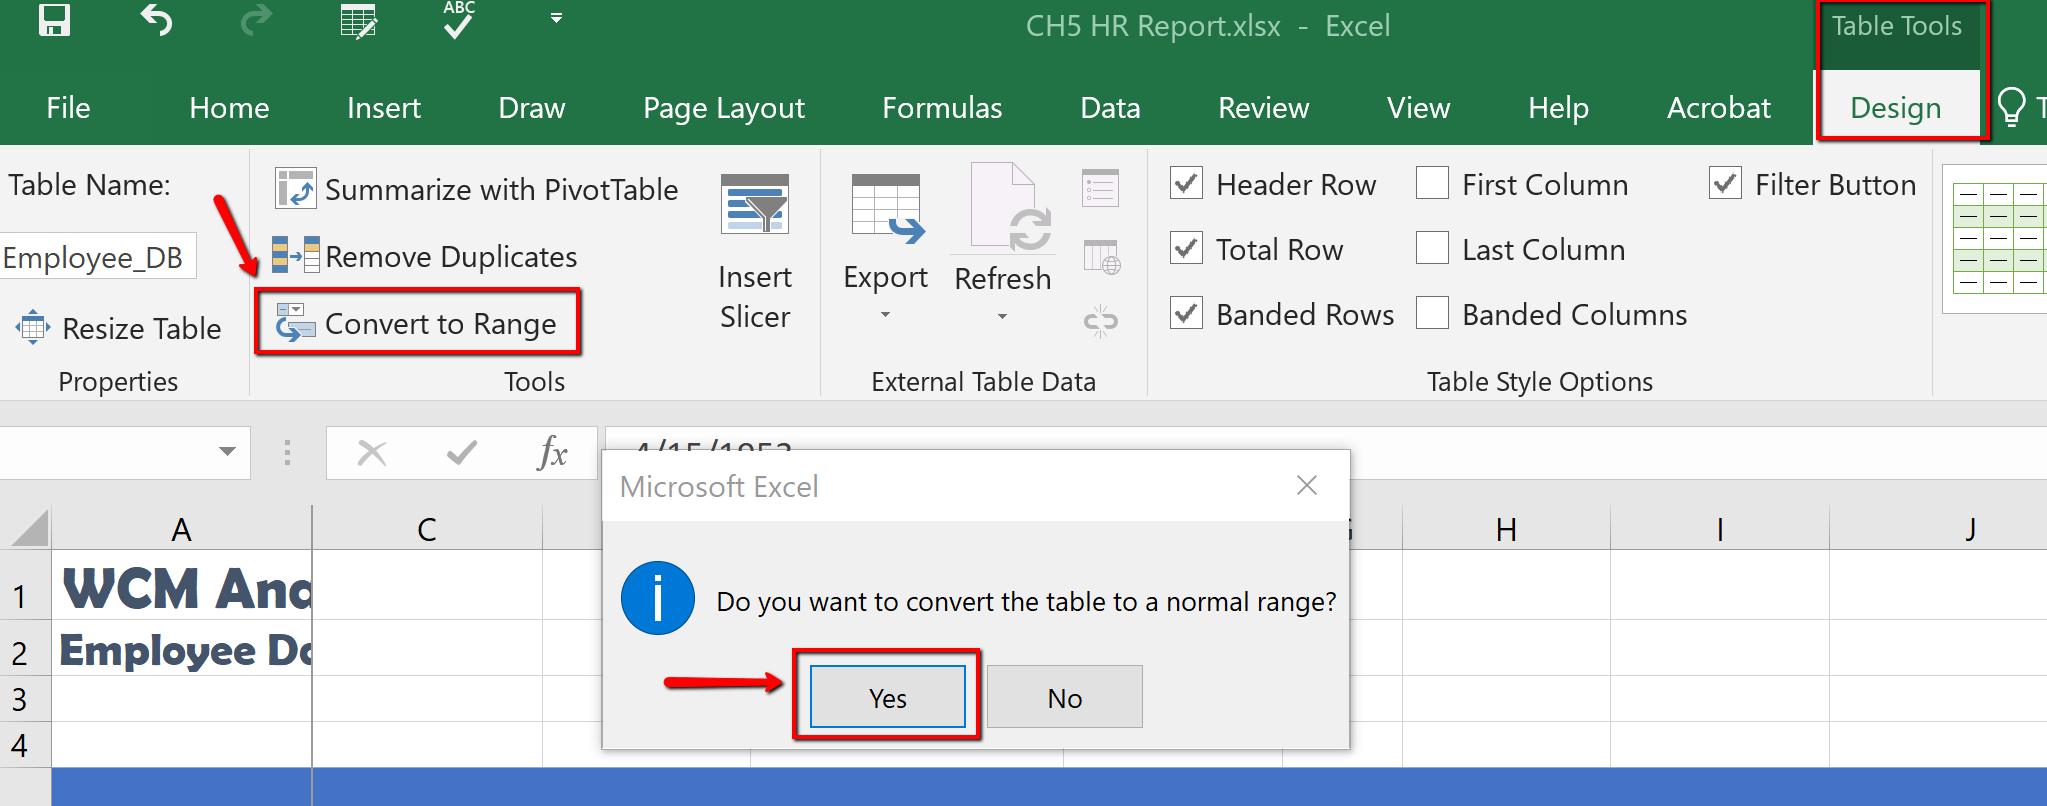 Screenshot of the Table Tools Design tab